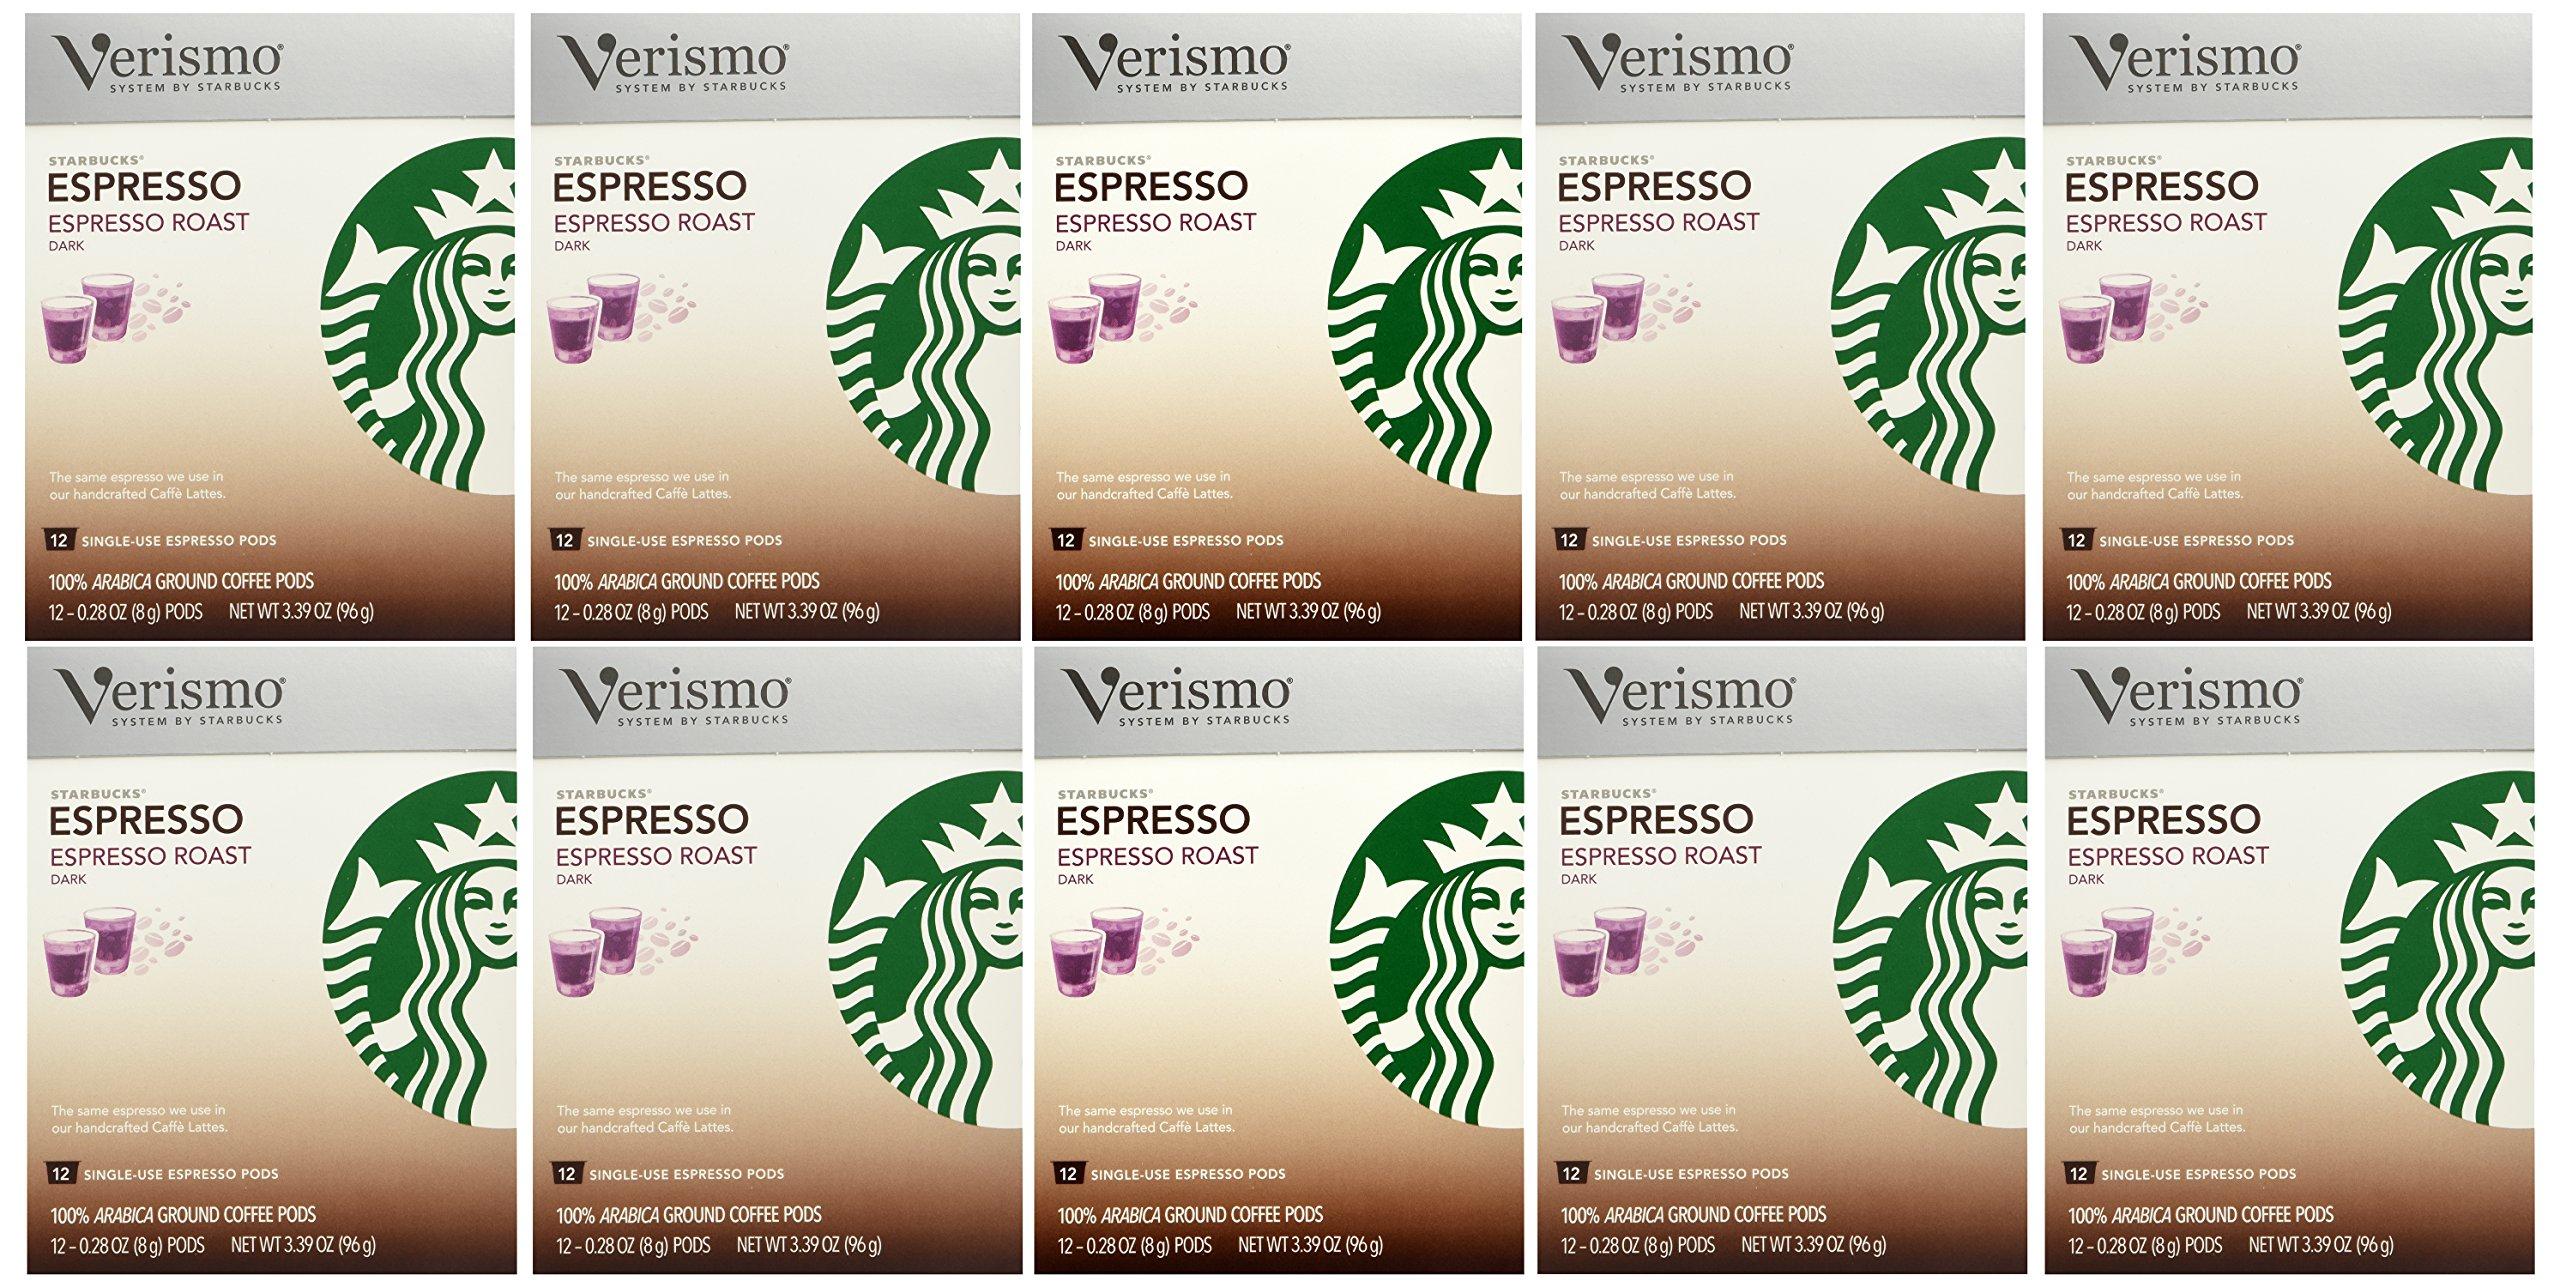 Starbucks Verismo Espresso Roast Espresso Pods - 12 ct(Pack of 12) by Starbucks